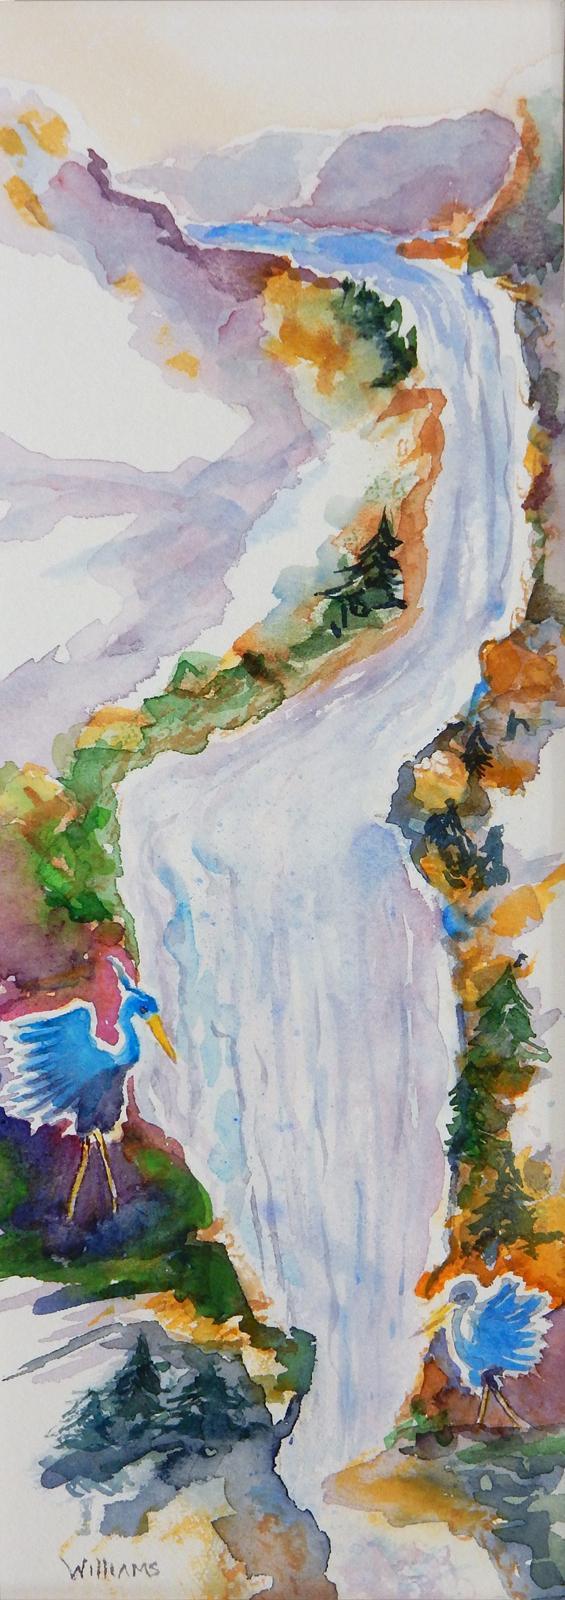 Winter Waterfall, Nancy M Williams